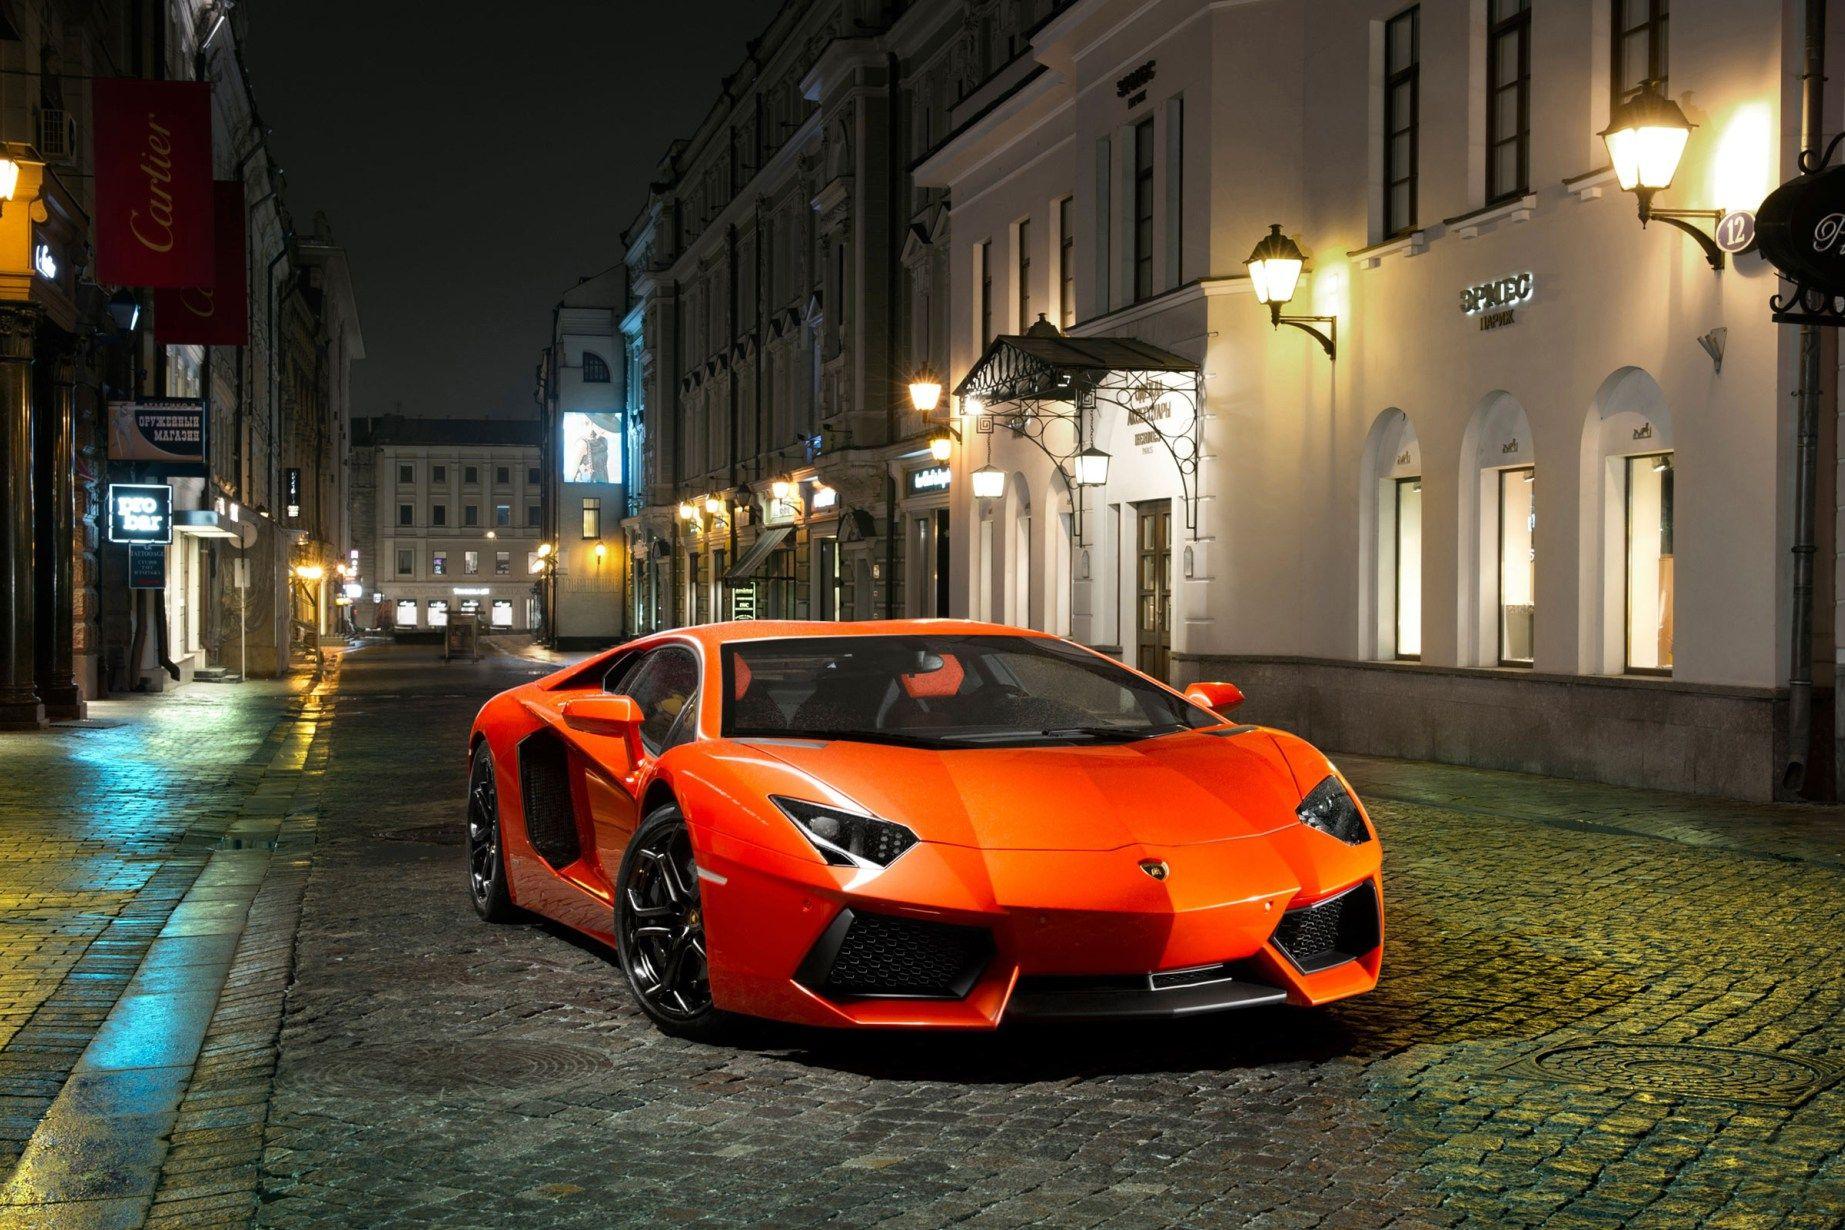 The average cost of car insurance for a lamborghini aventador is $288 a month, or $3,456 a year. Lamborghini Car Wallpaper Hd Download 1845x1230 Download Hd Wallpaper Wallpapertip